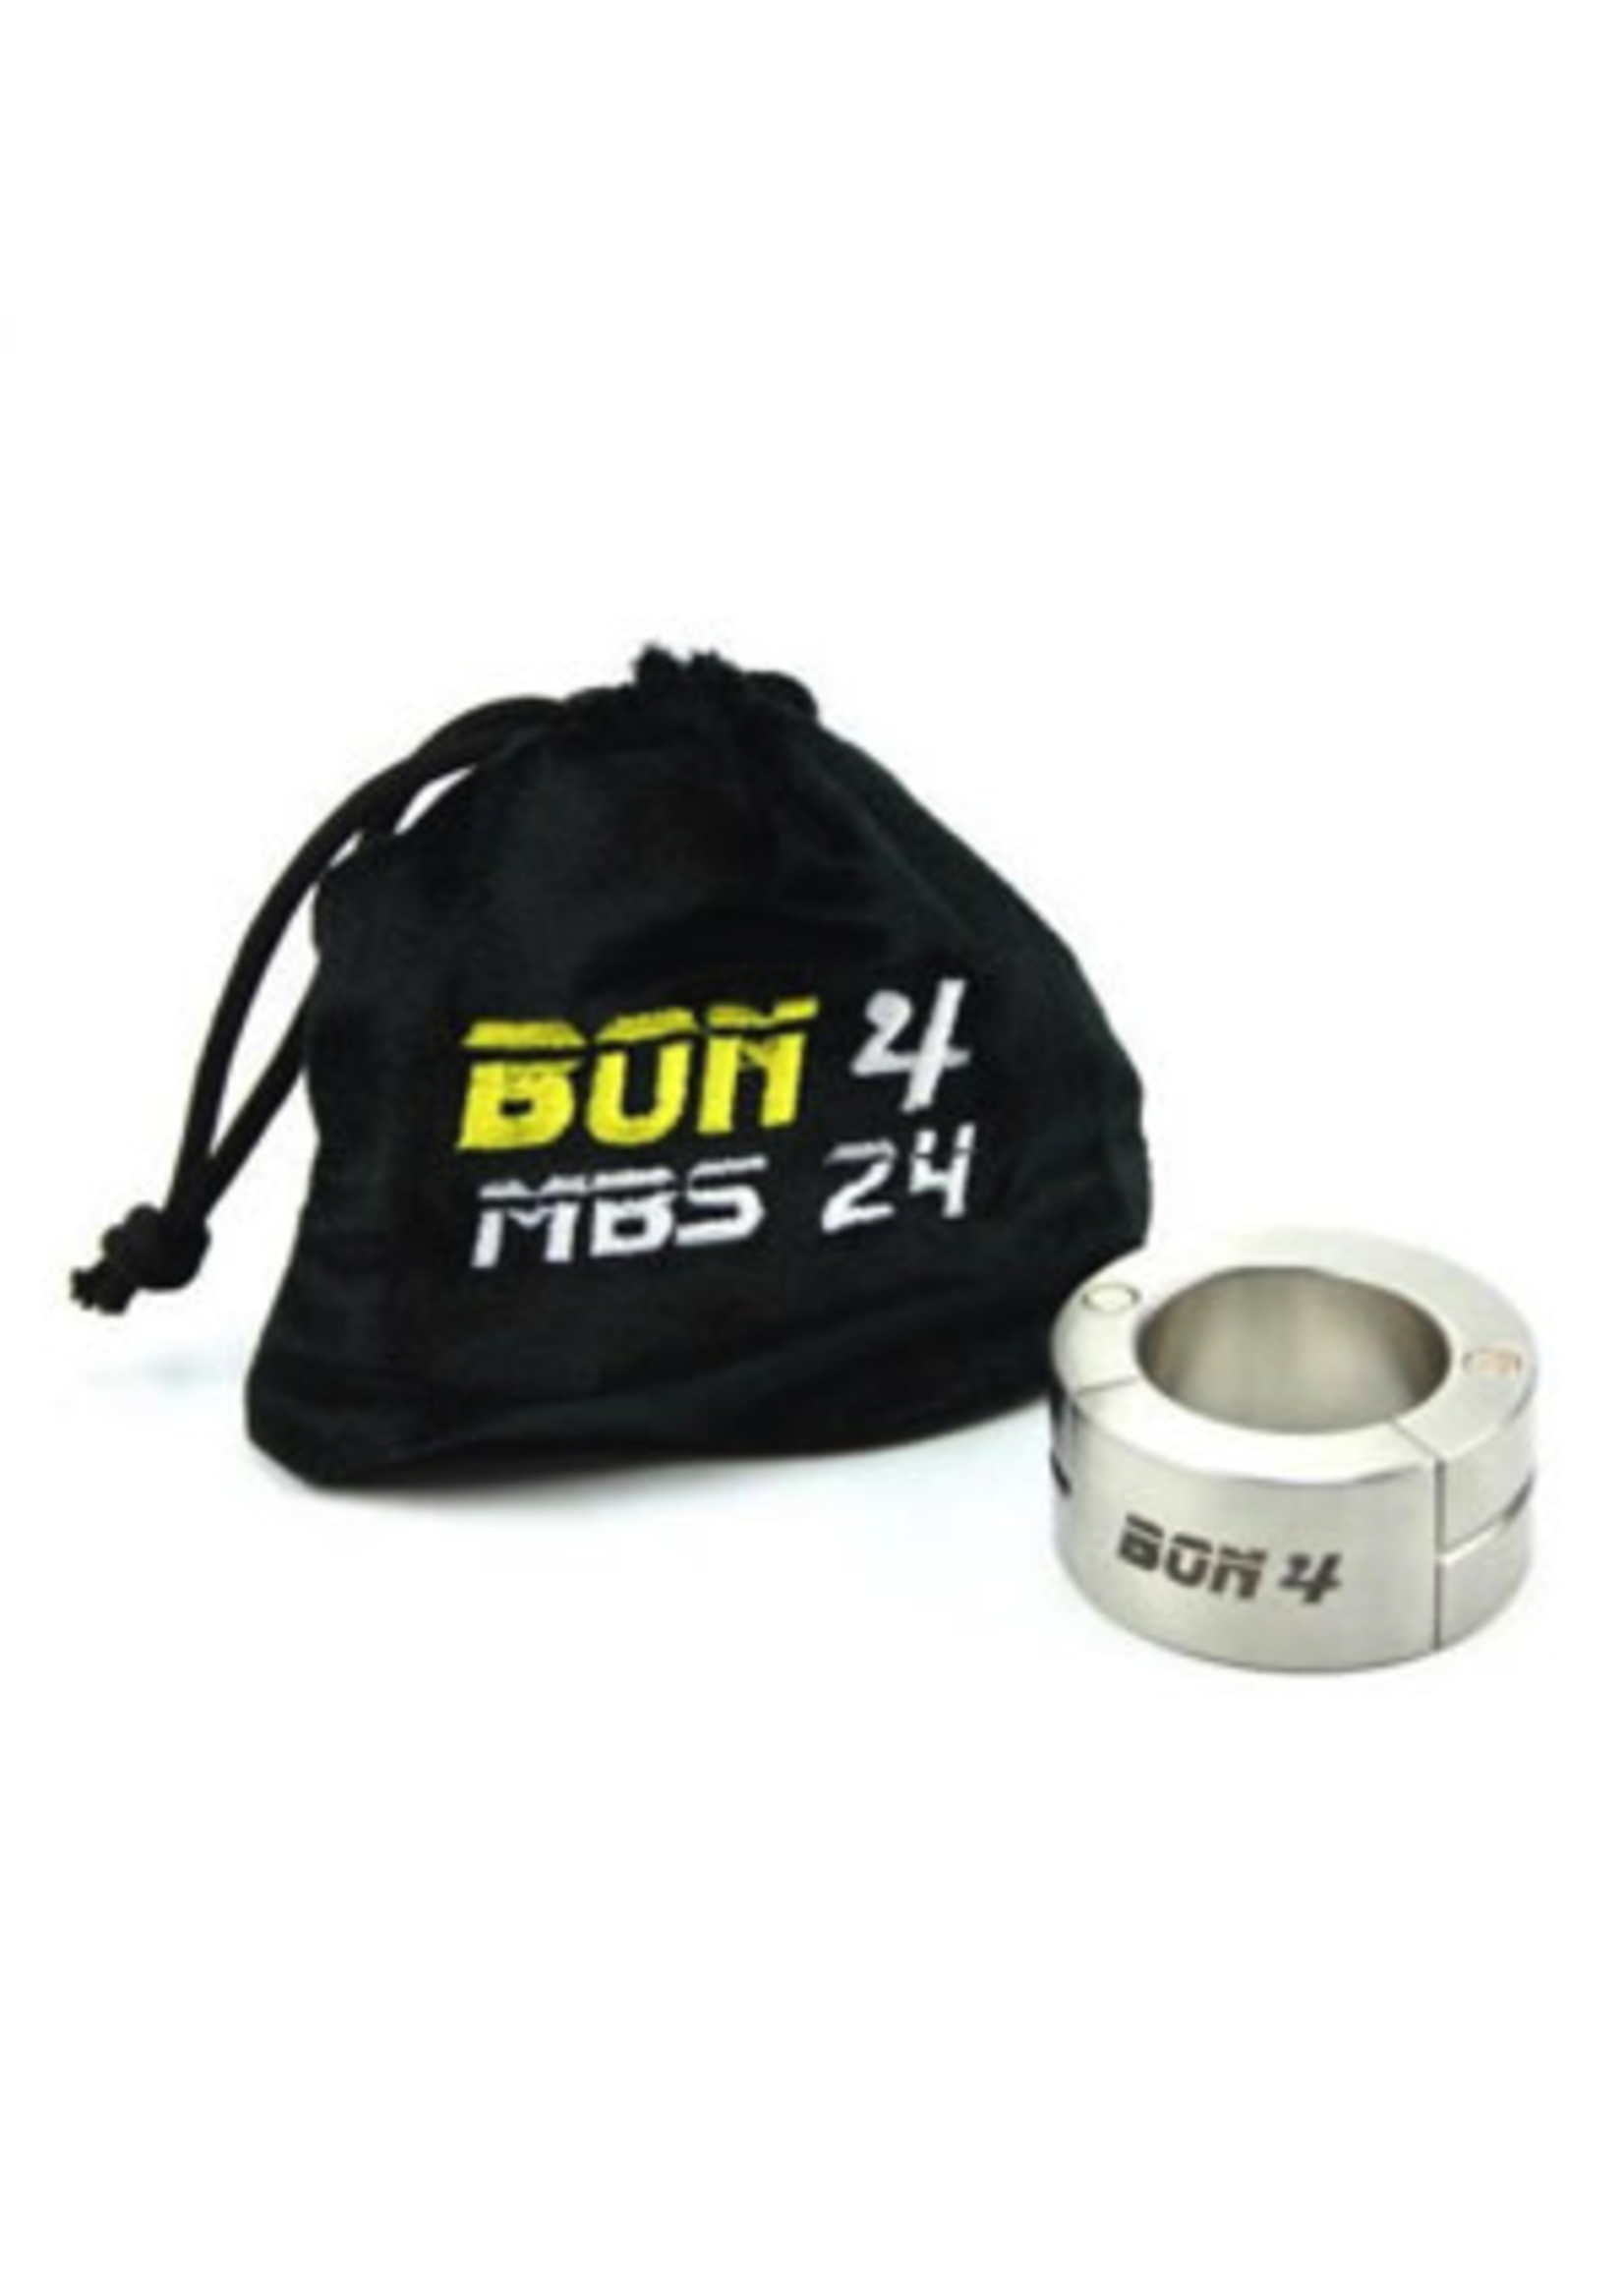 Bon4 BON4MBS 24 Ball Stretcher